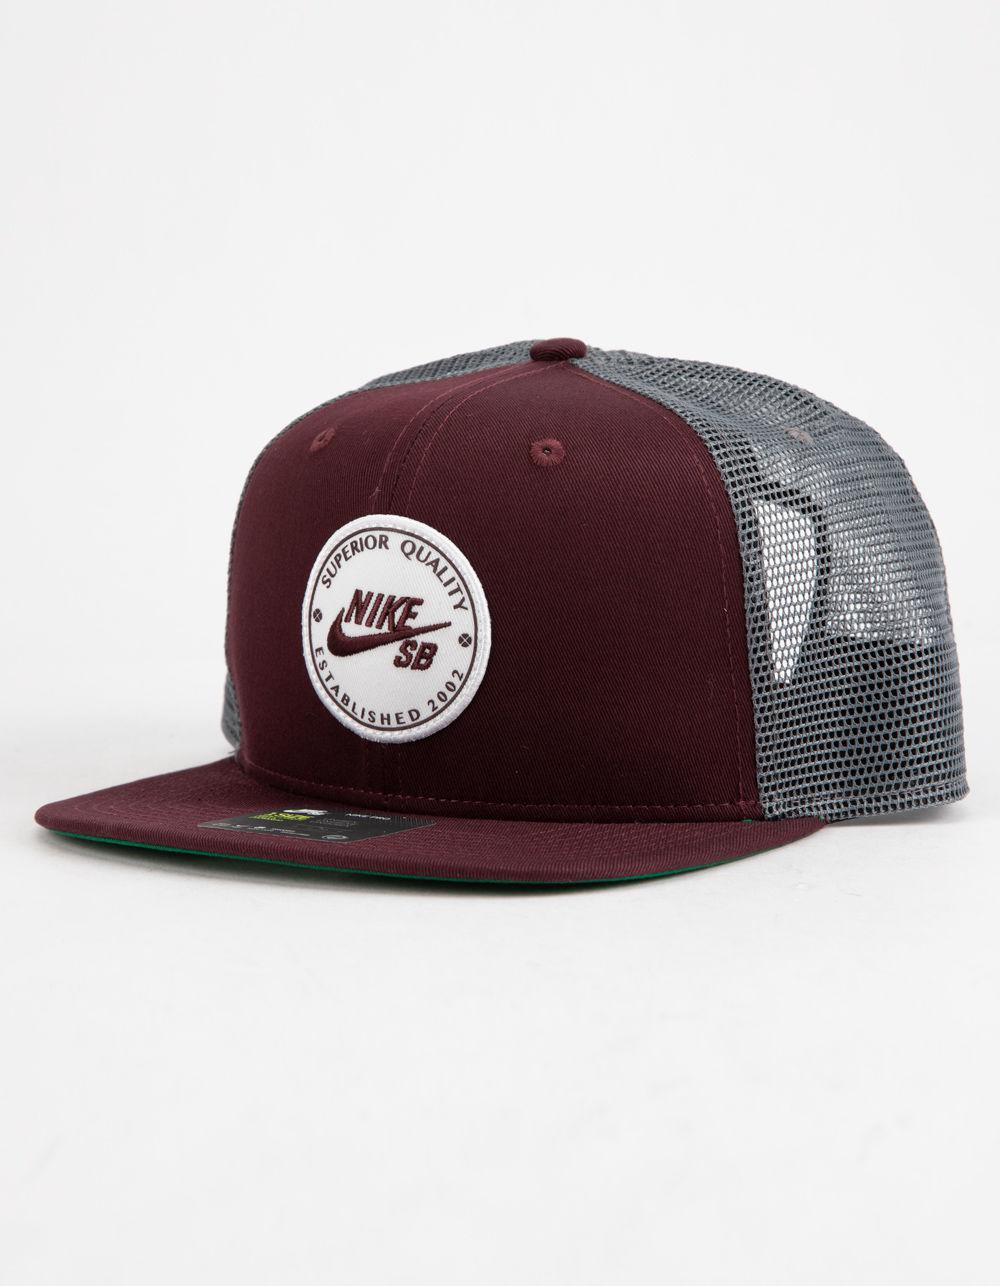 Lyst - Nike Pro Cap Patch Burgundy Mens Trucker Hat for Men ad82b7424adf